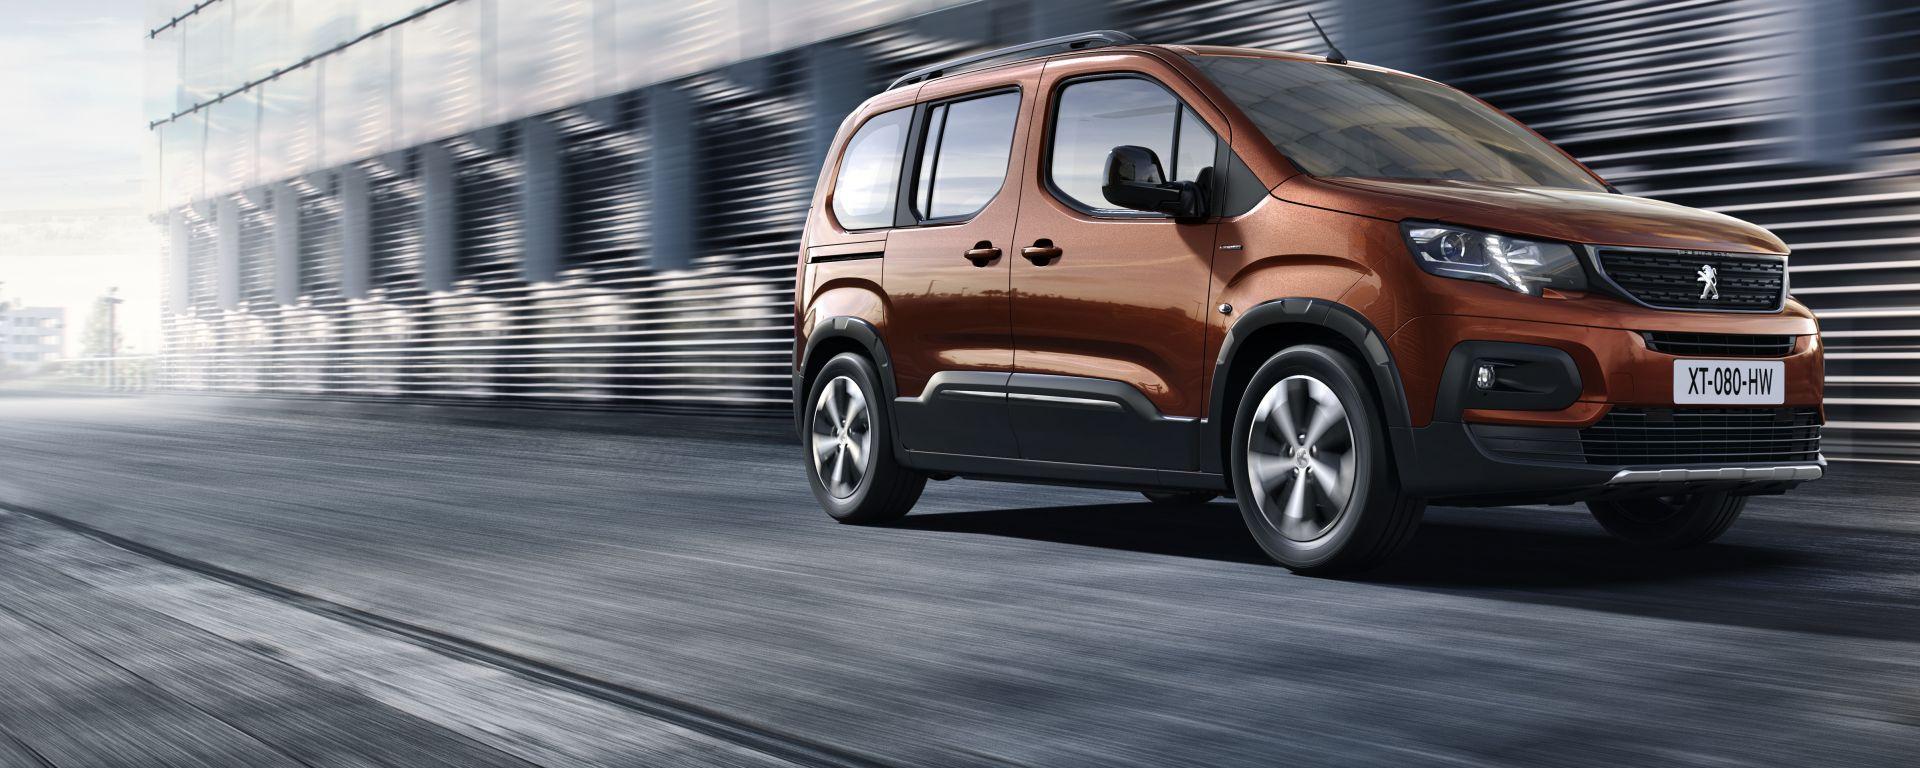 Nuovo Peugeot Rifter 2019, novità da Peugeot